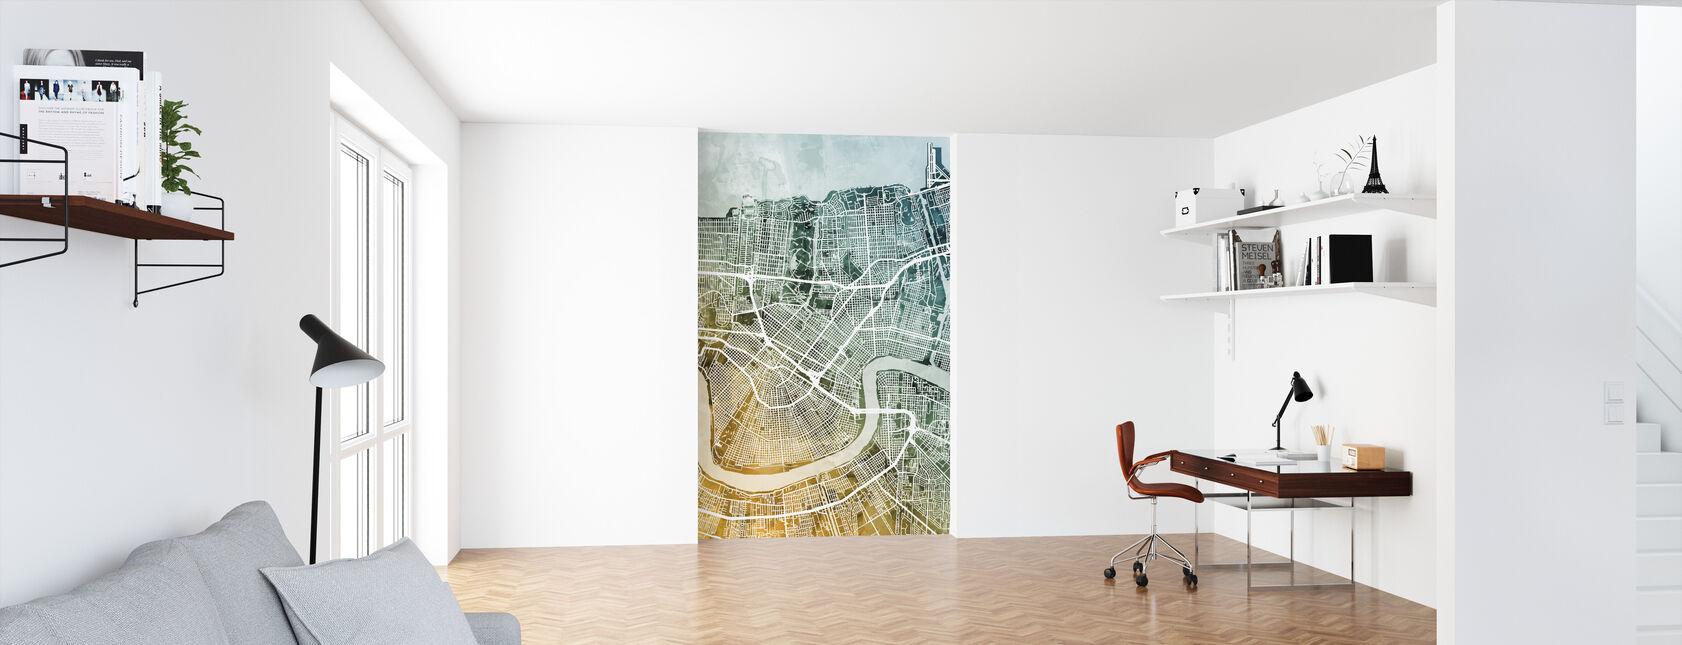 New Orleans City Street Map - Wallpaper - Office